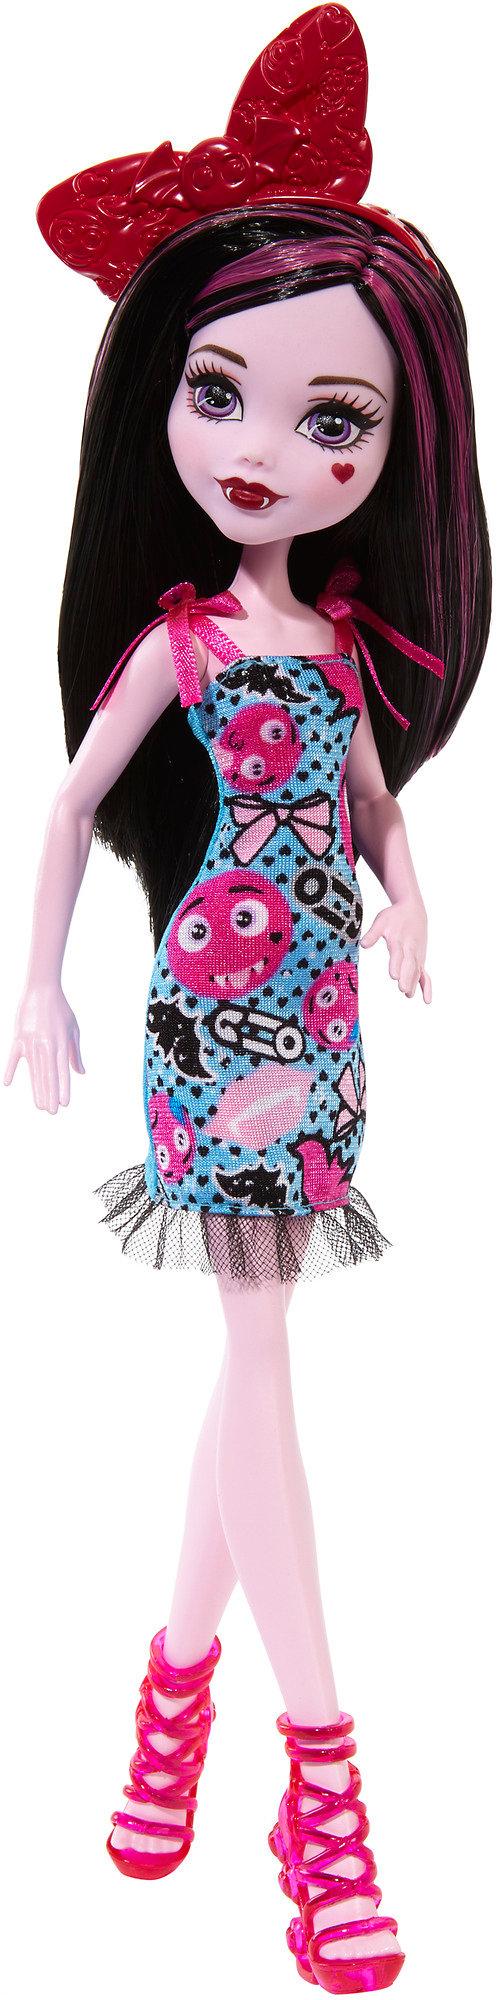 Monster High Emoji Draculaura Doll by Mattel